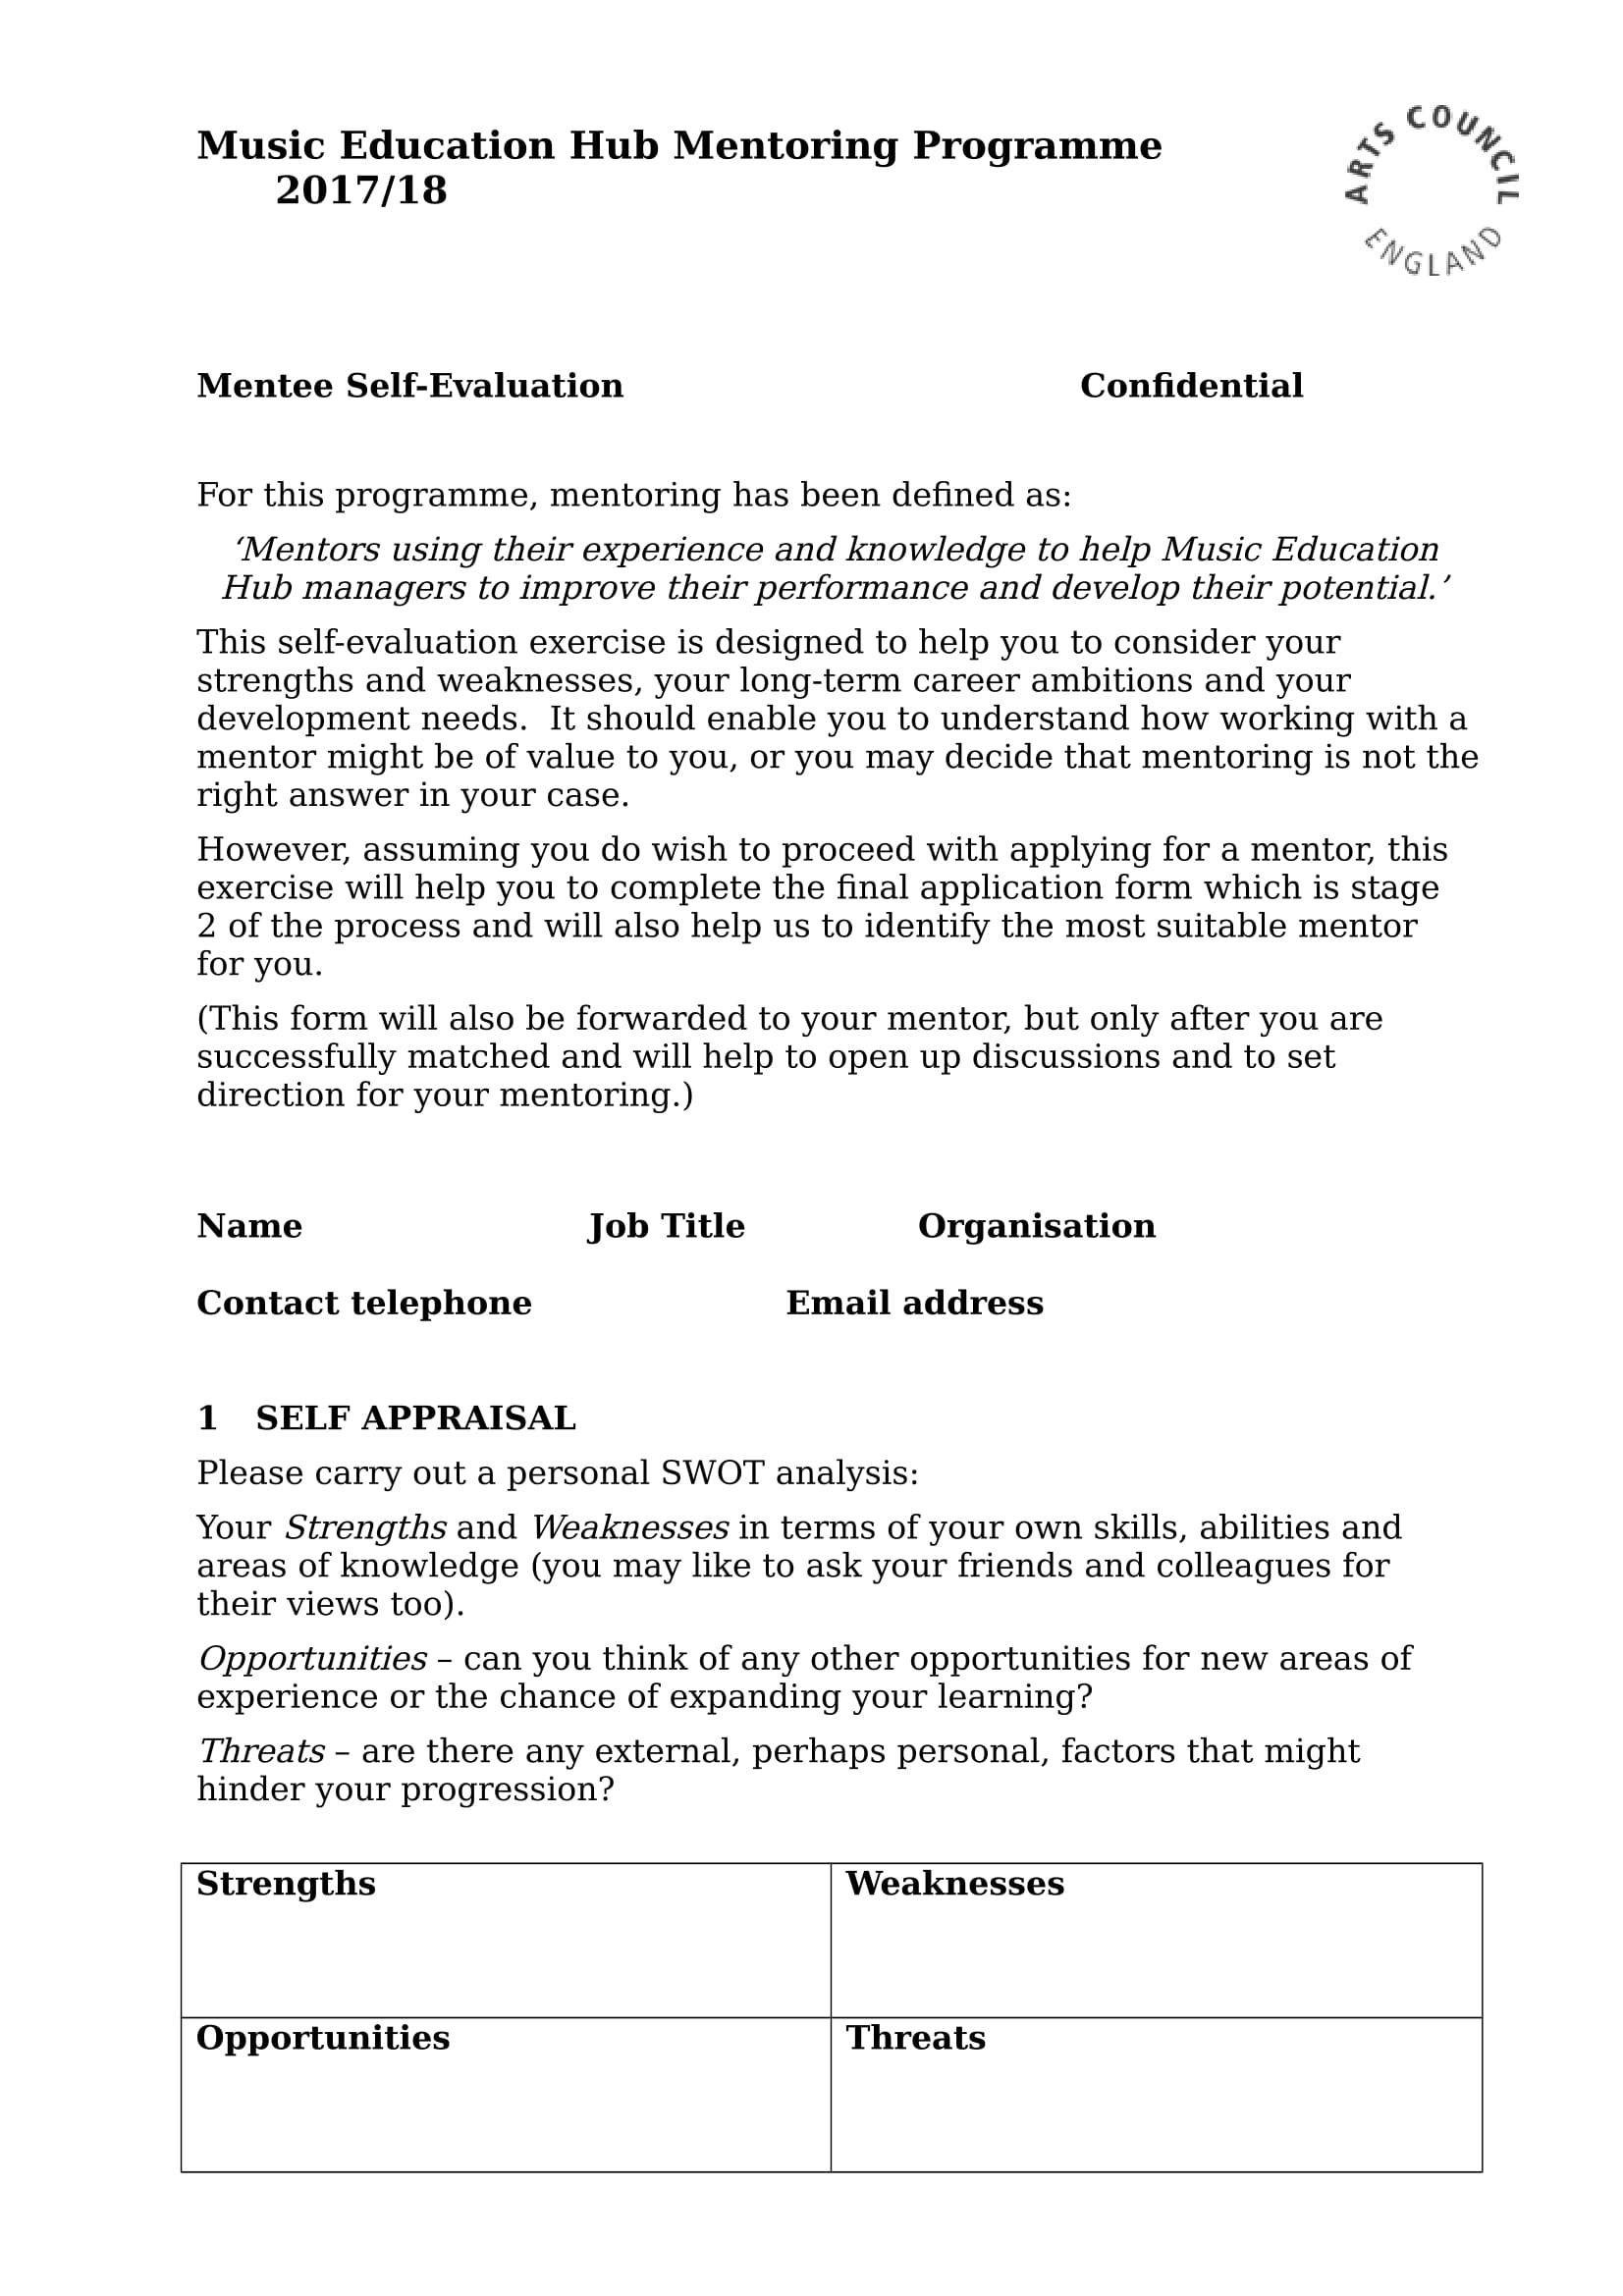 mentee self evaluation form 1